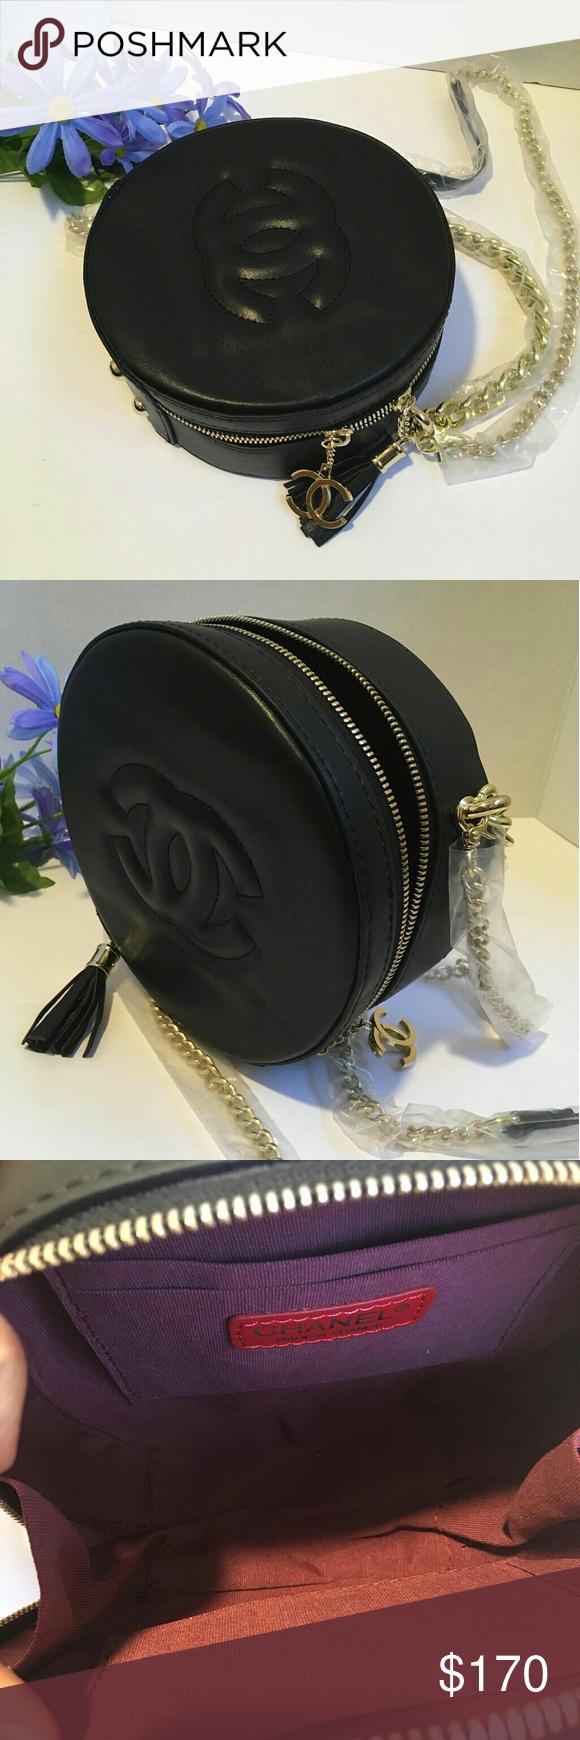 e246ef0c6584d6 Vip gift round bag like new Premium VIP Gift round shoulder bag ,cross body  Chanel